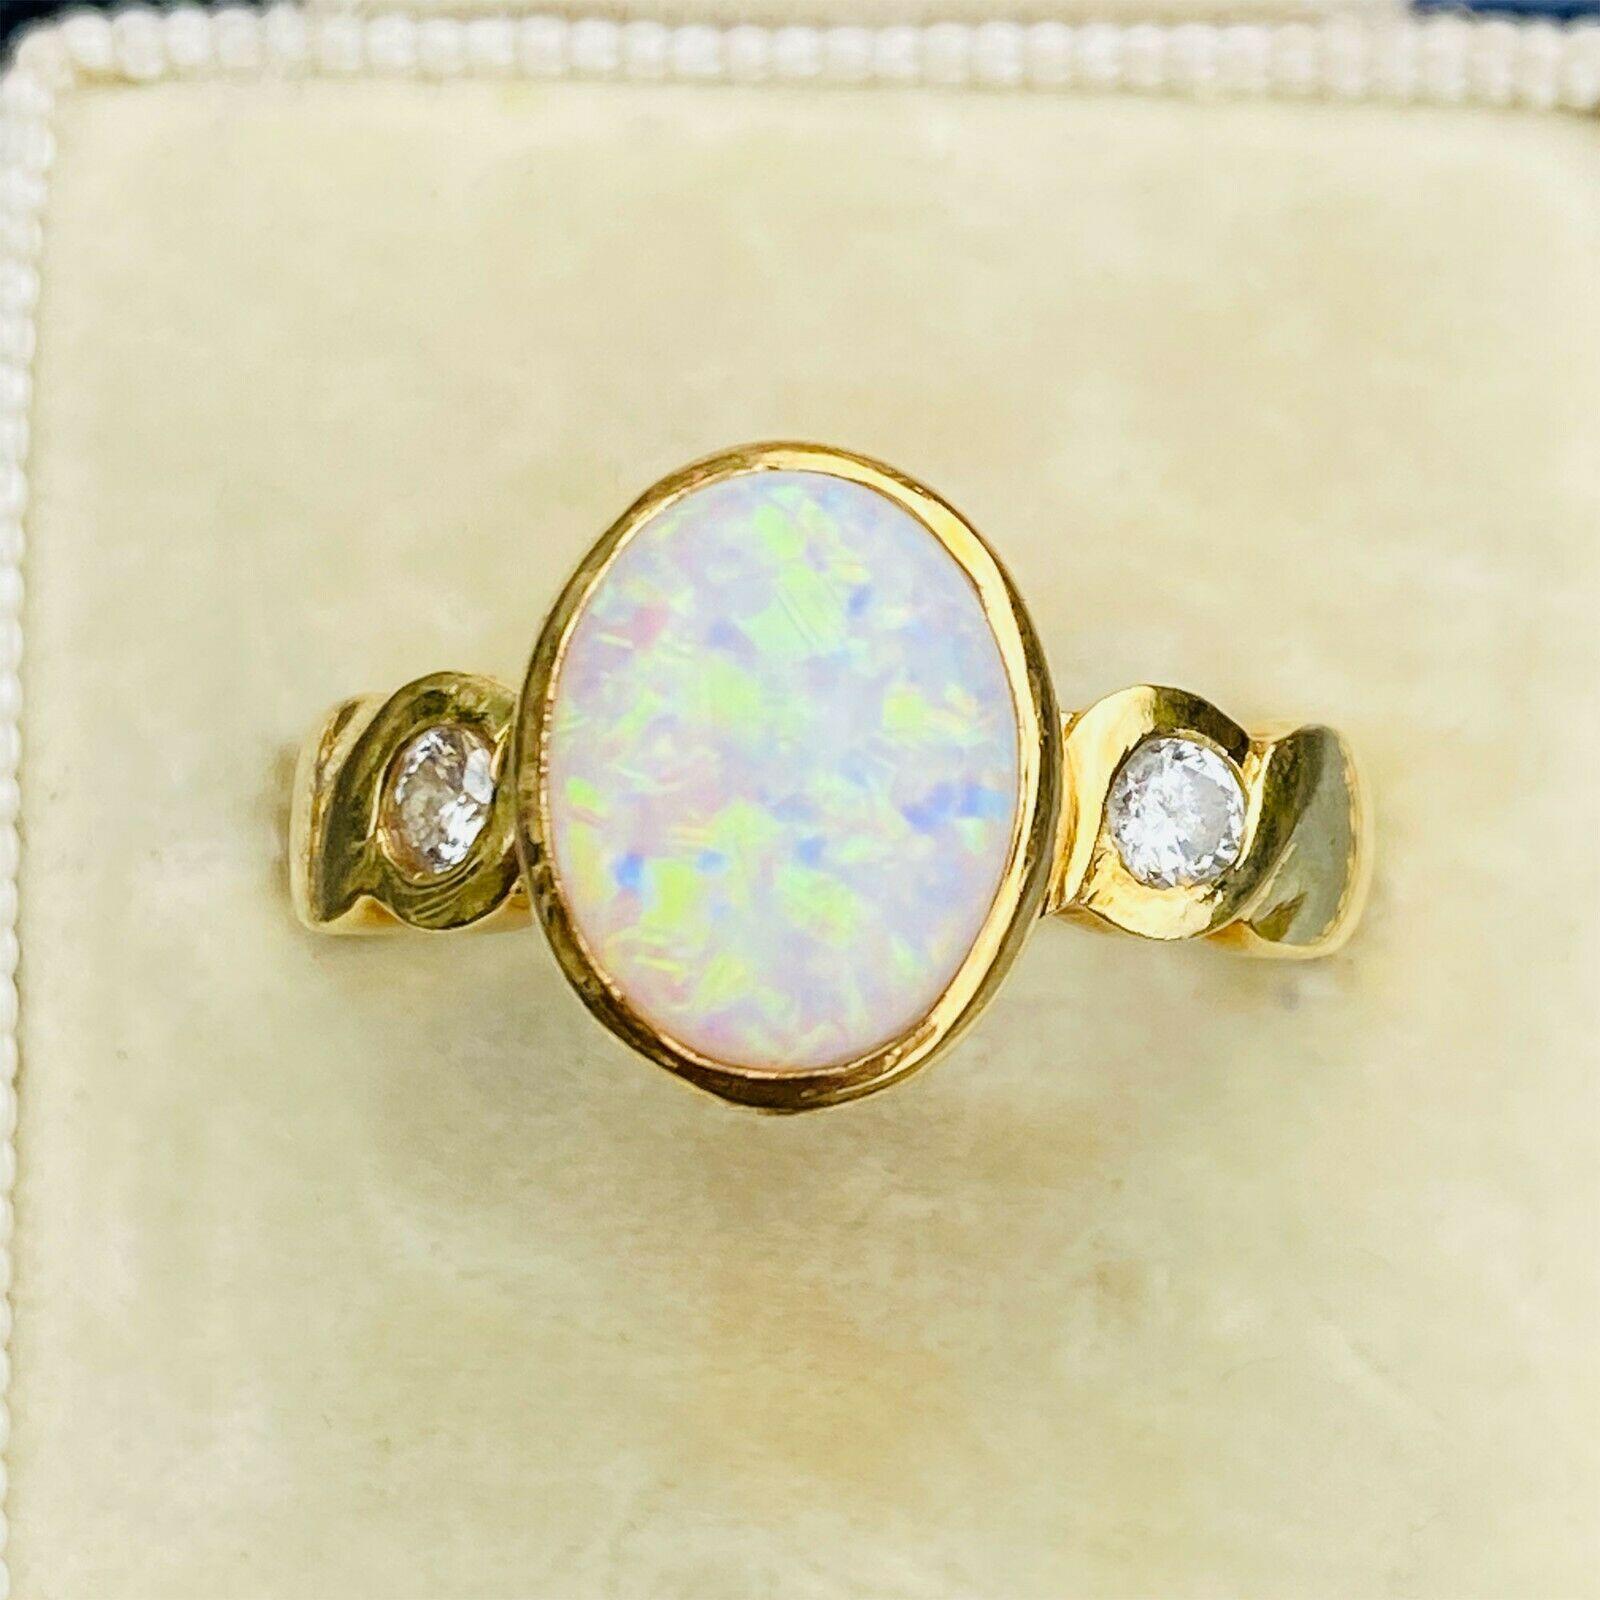 Stunning 18ct, 18k, 750 Gold Opal & Diamond three stone ring, date 1994